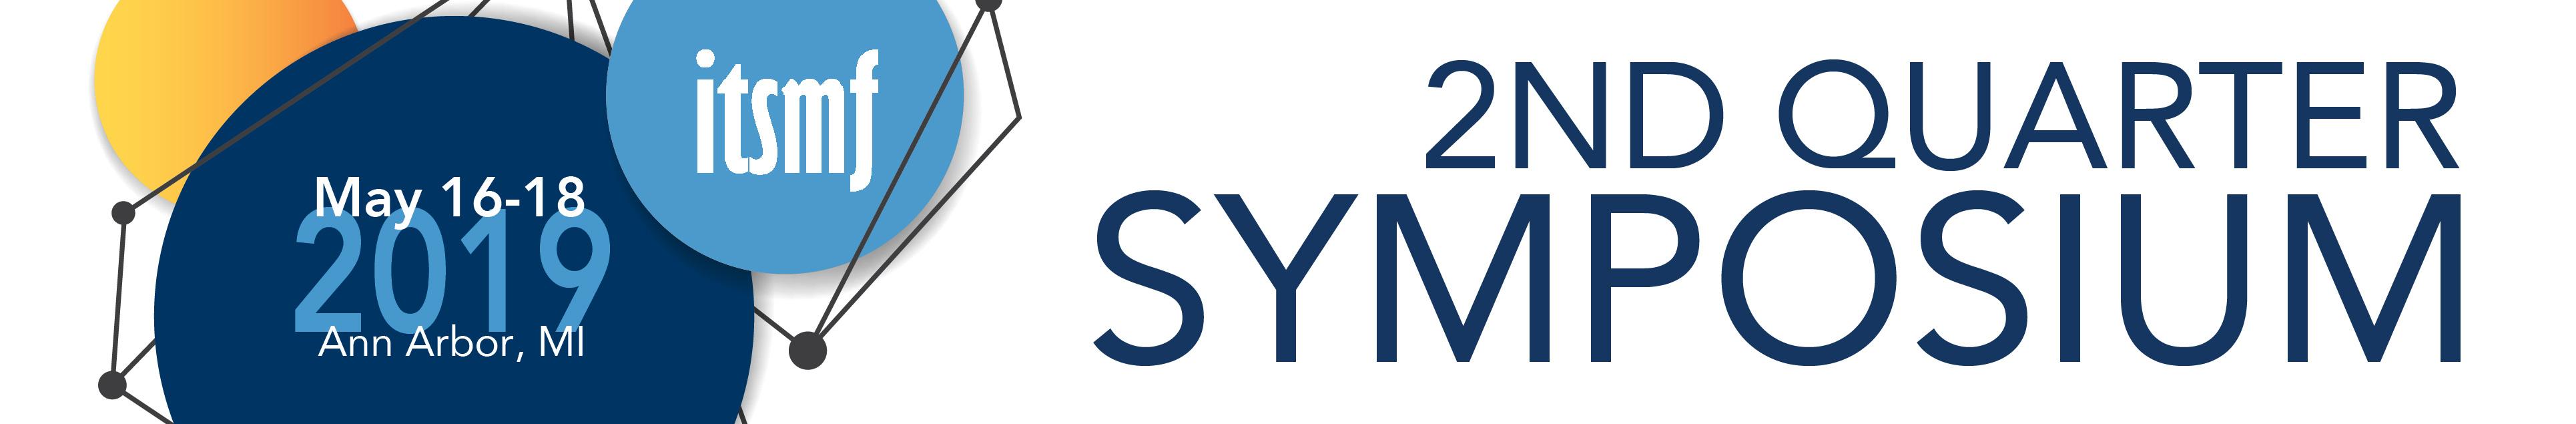 2nd Quarter 2019 Symposium & Leadership Academy Graduation